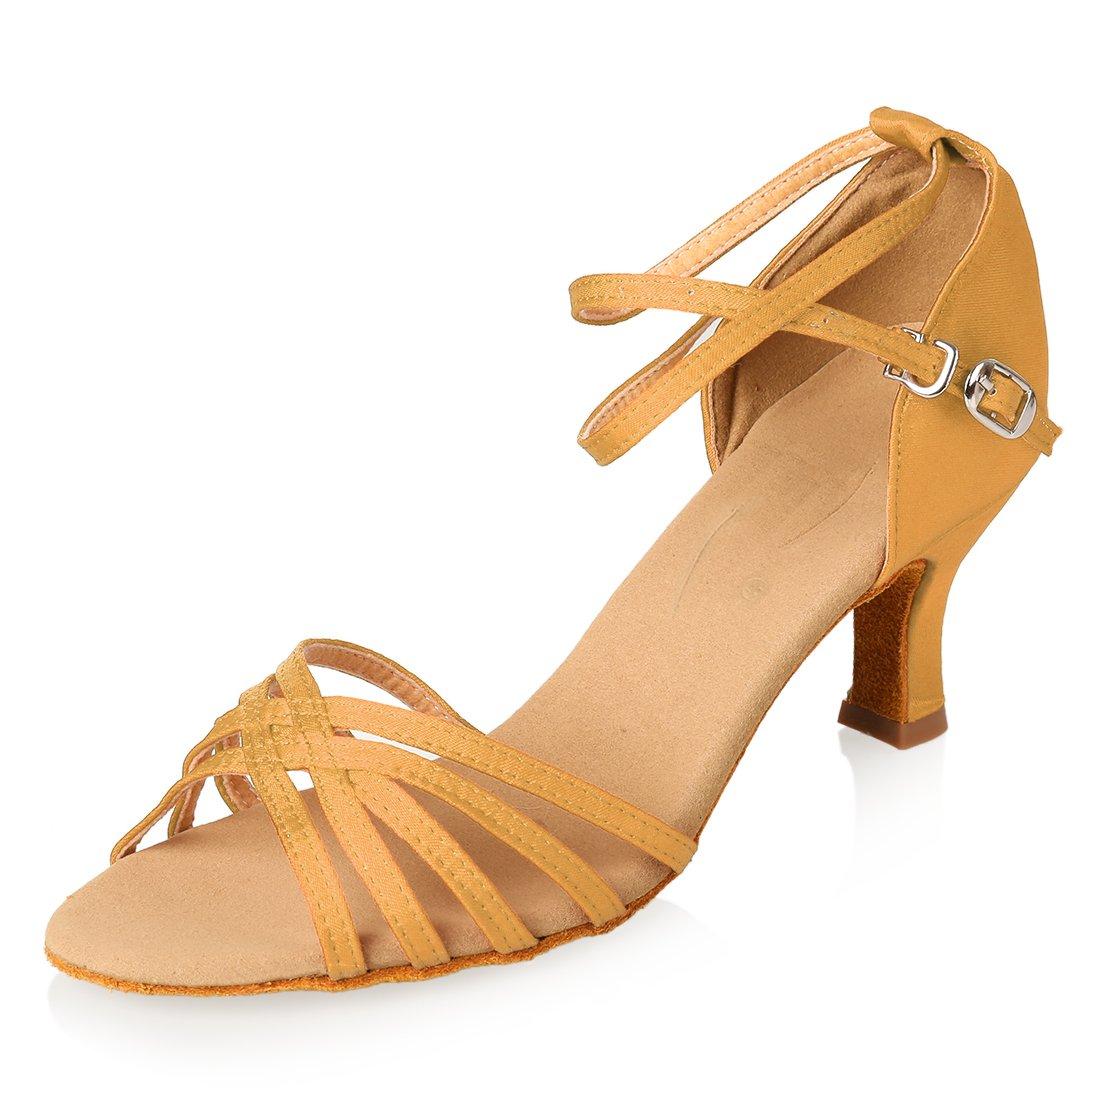 APTRO Damen Schuhe Tanzschuhe Ballsaal Latin Tanzen Silber Sandalen  38 EU|Gleb